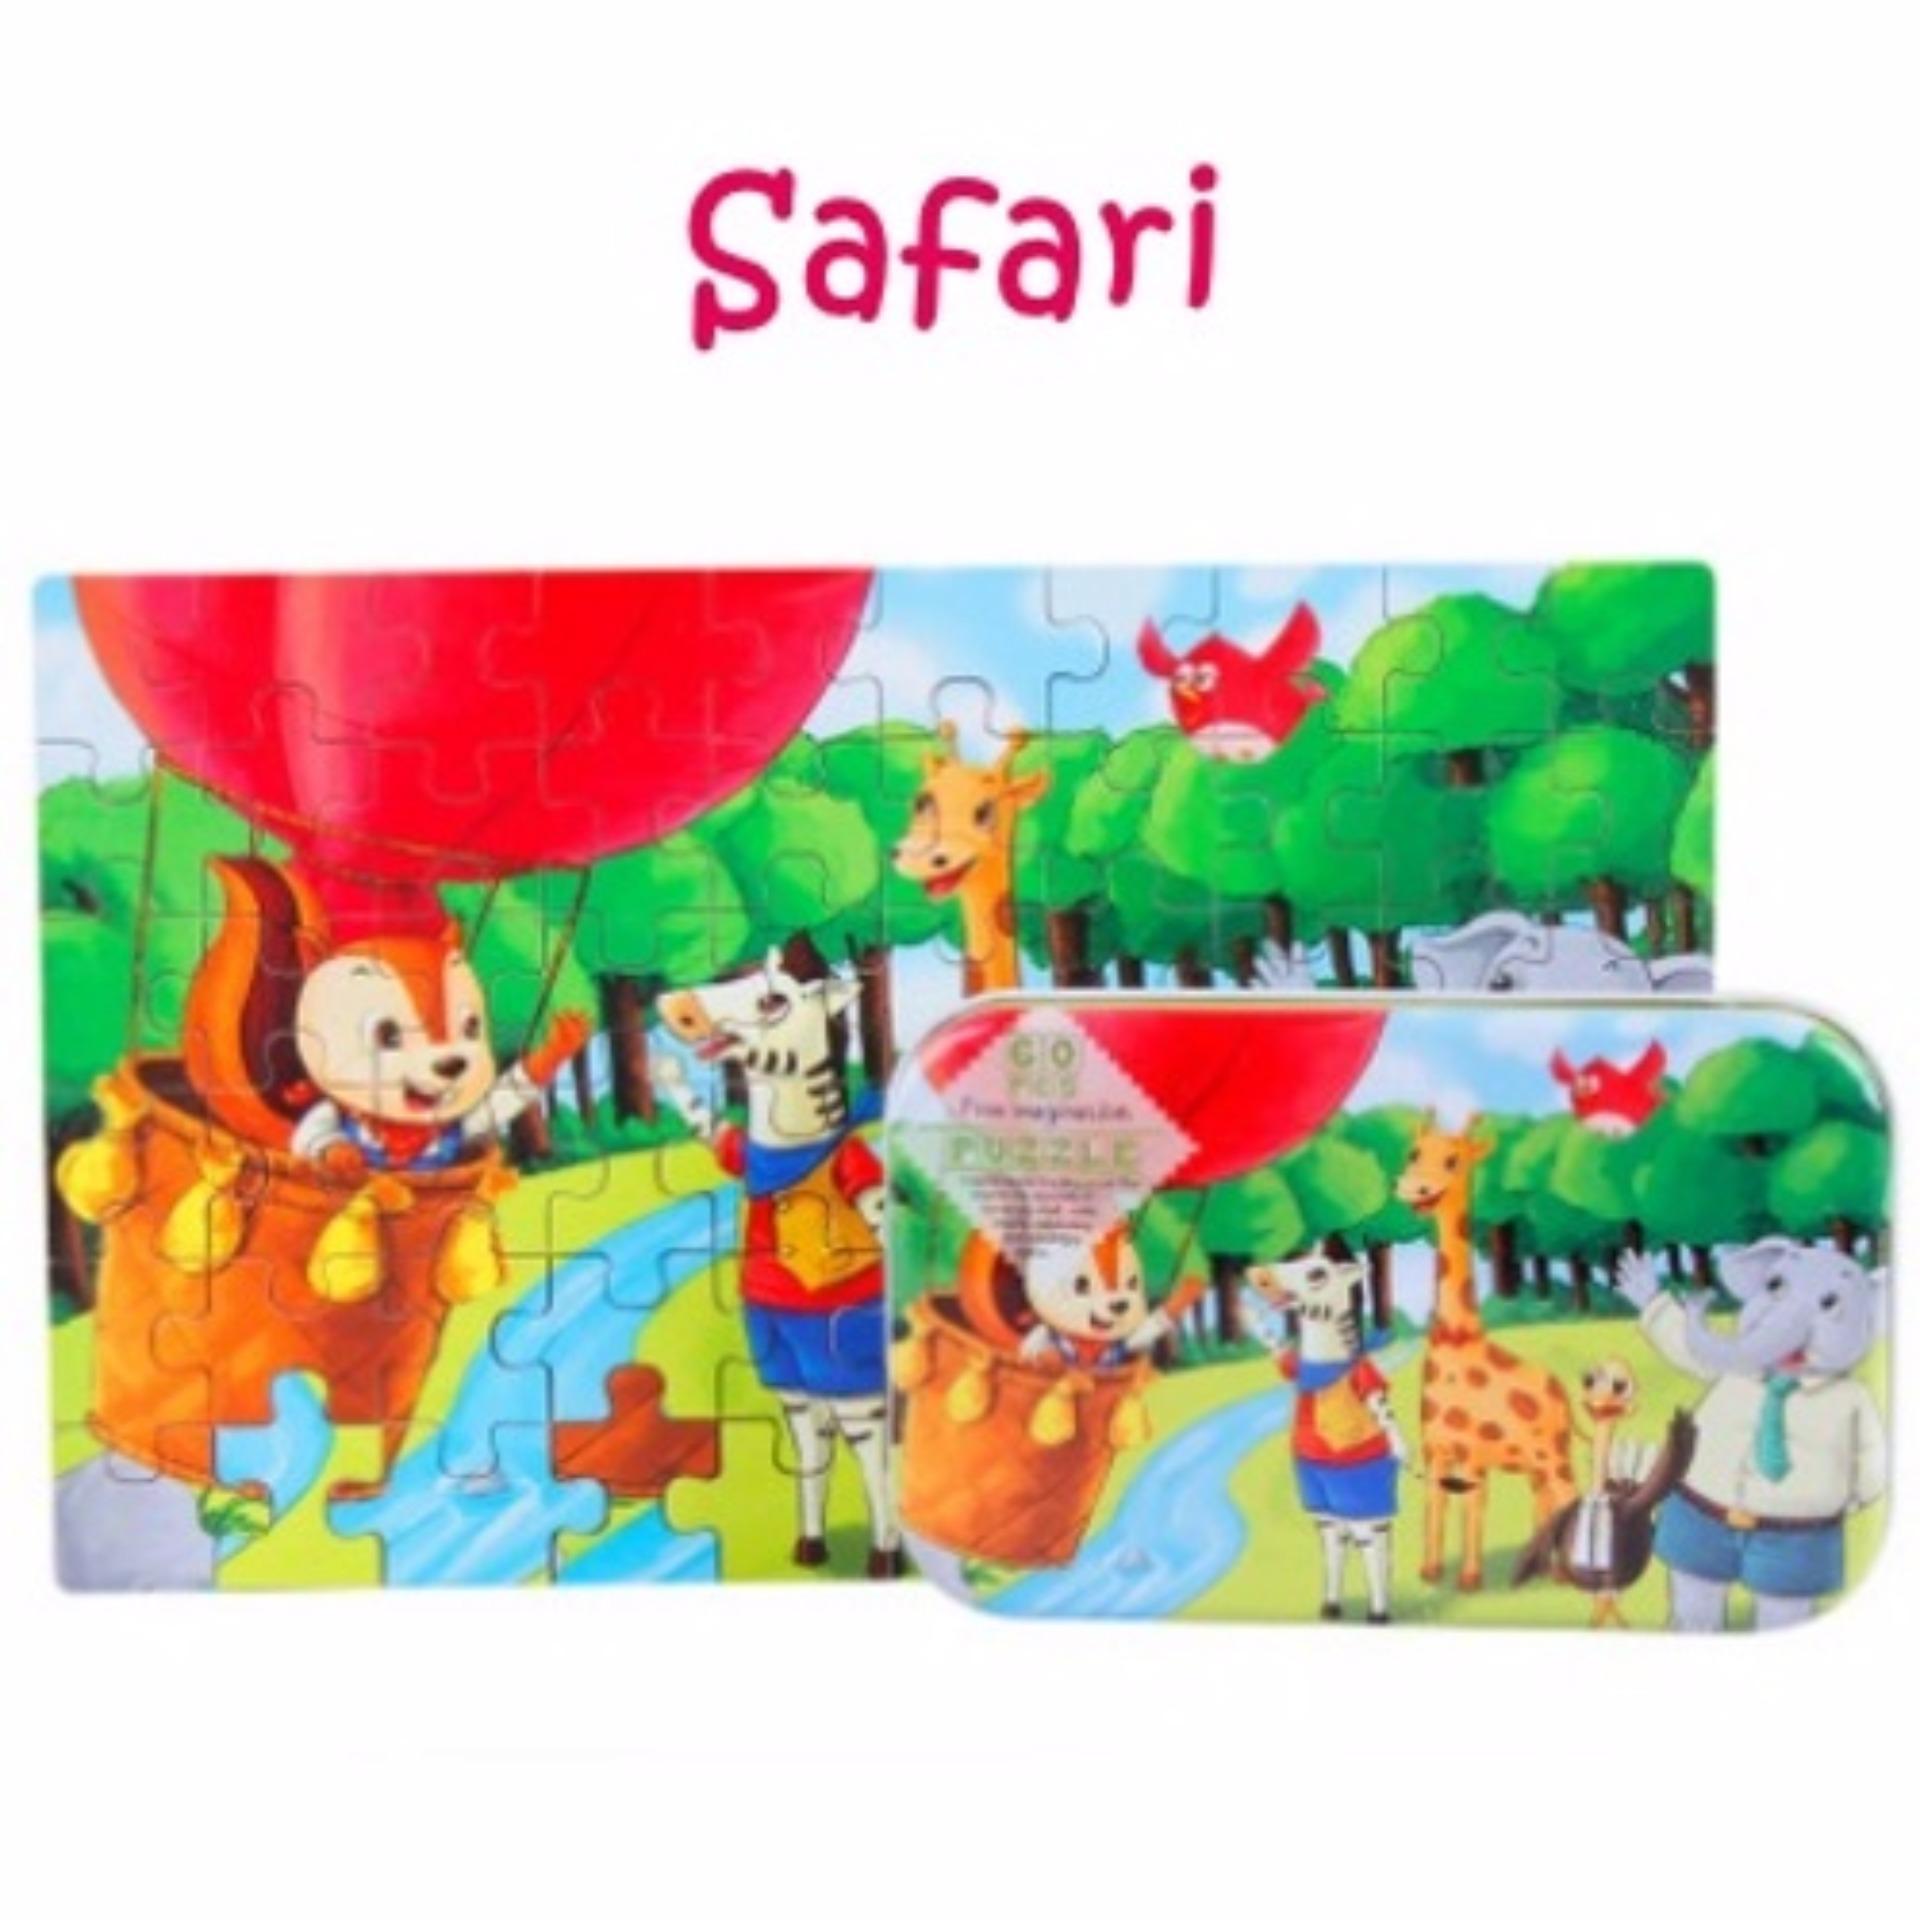 60 pieces wooden jigsaw puzzle in tin box safari lazada singapore